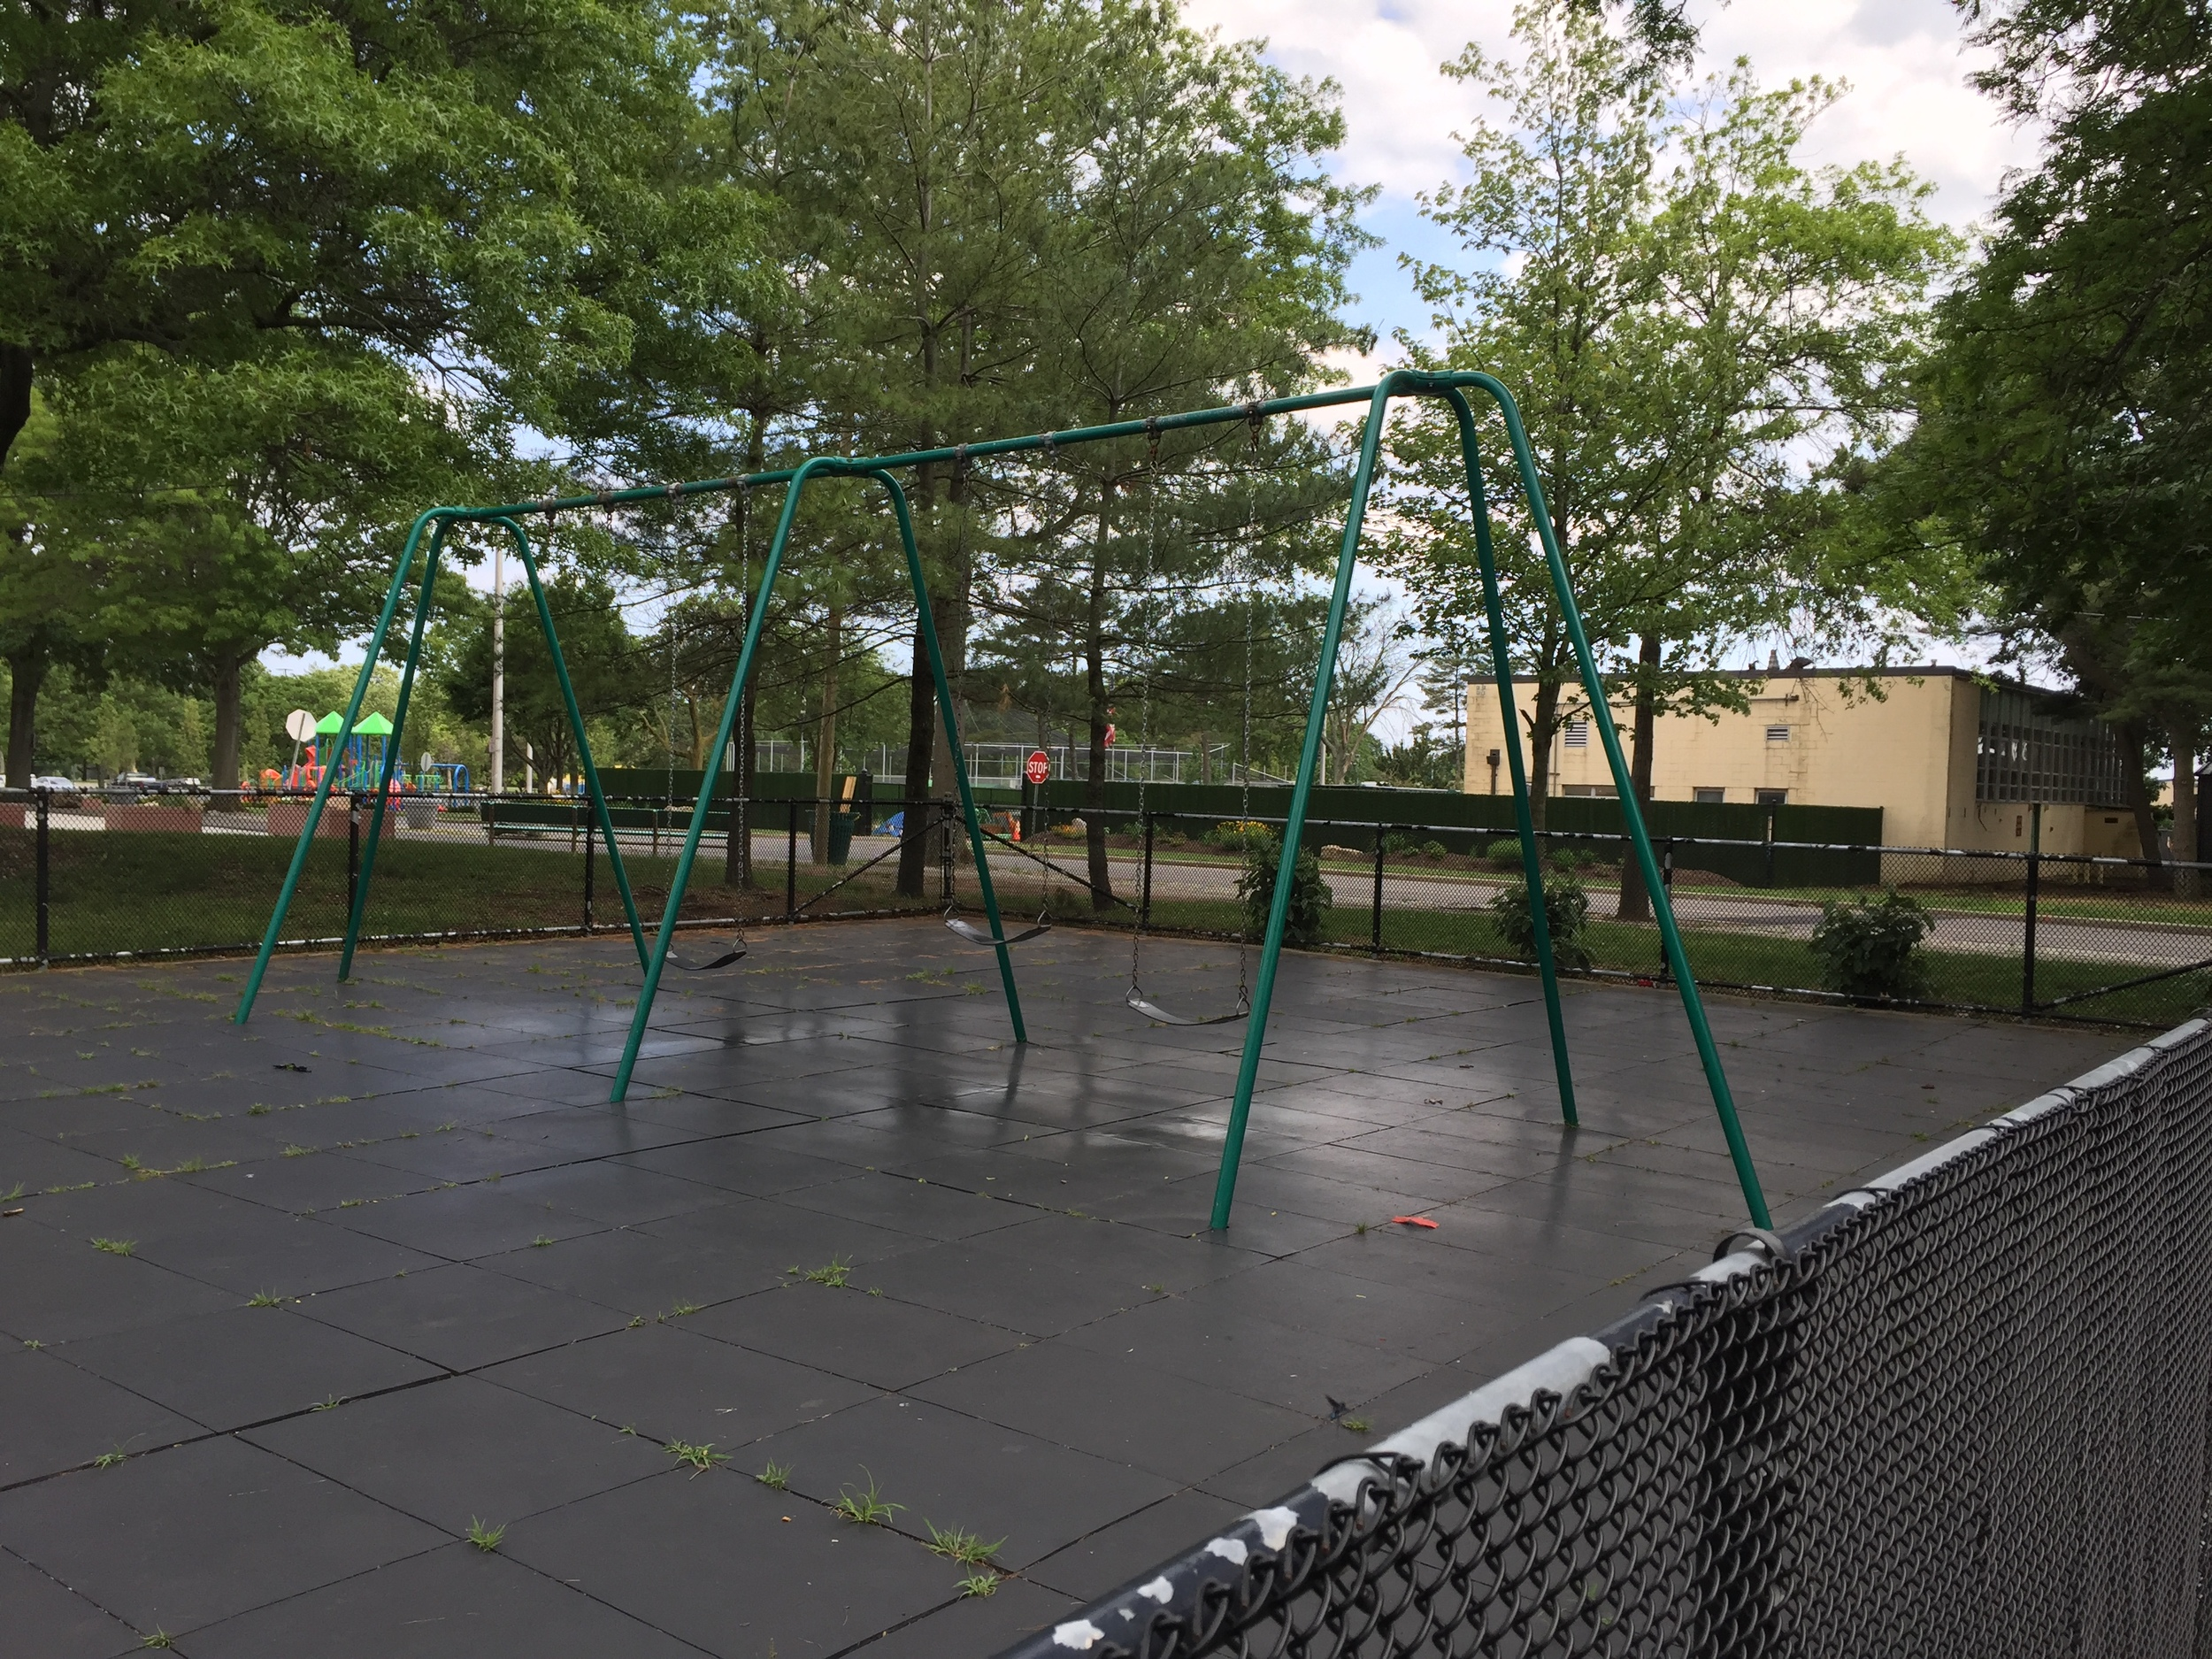 Playground at Cantiague Park